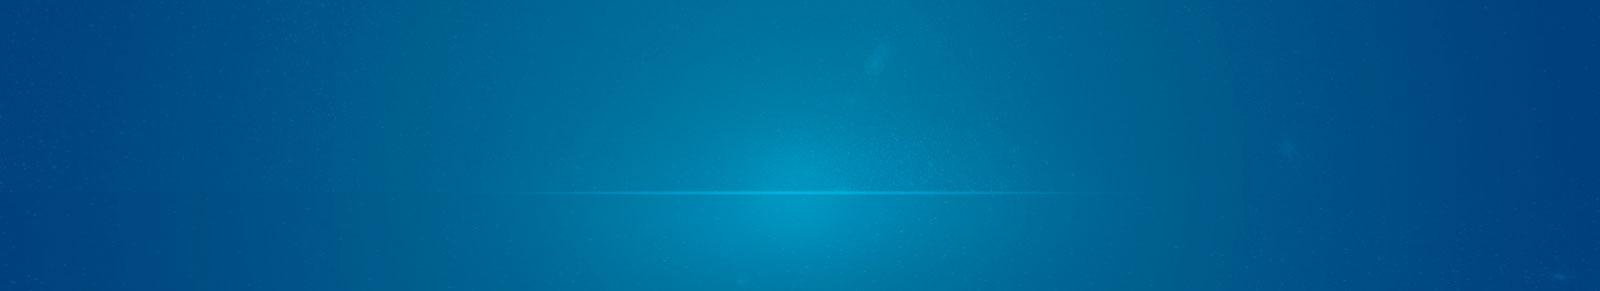 background-azul